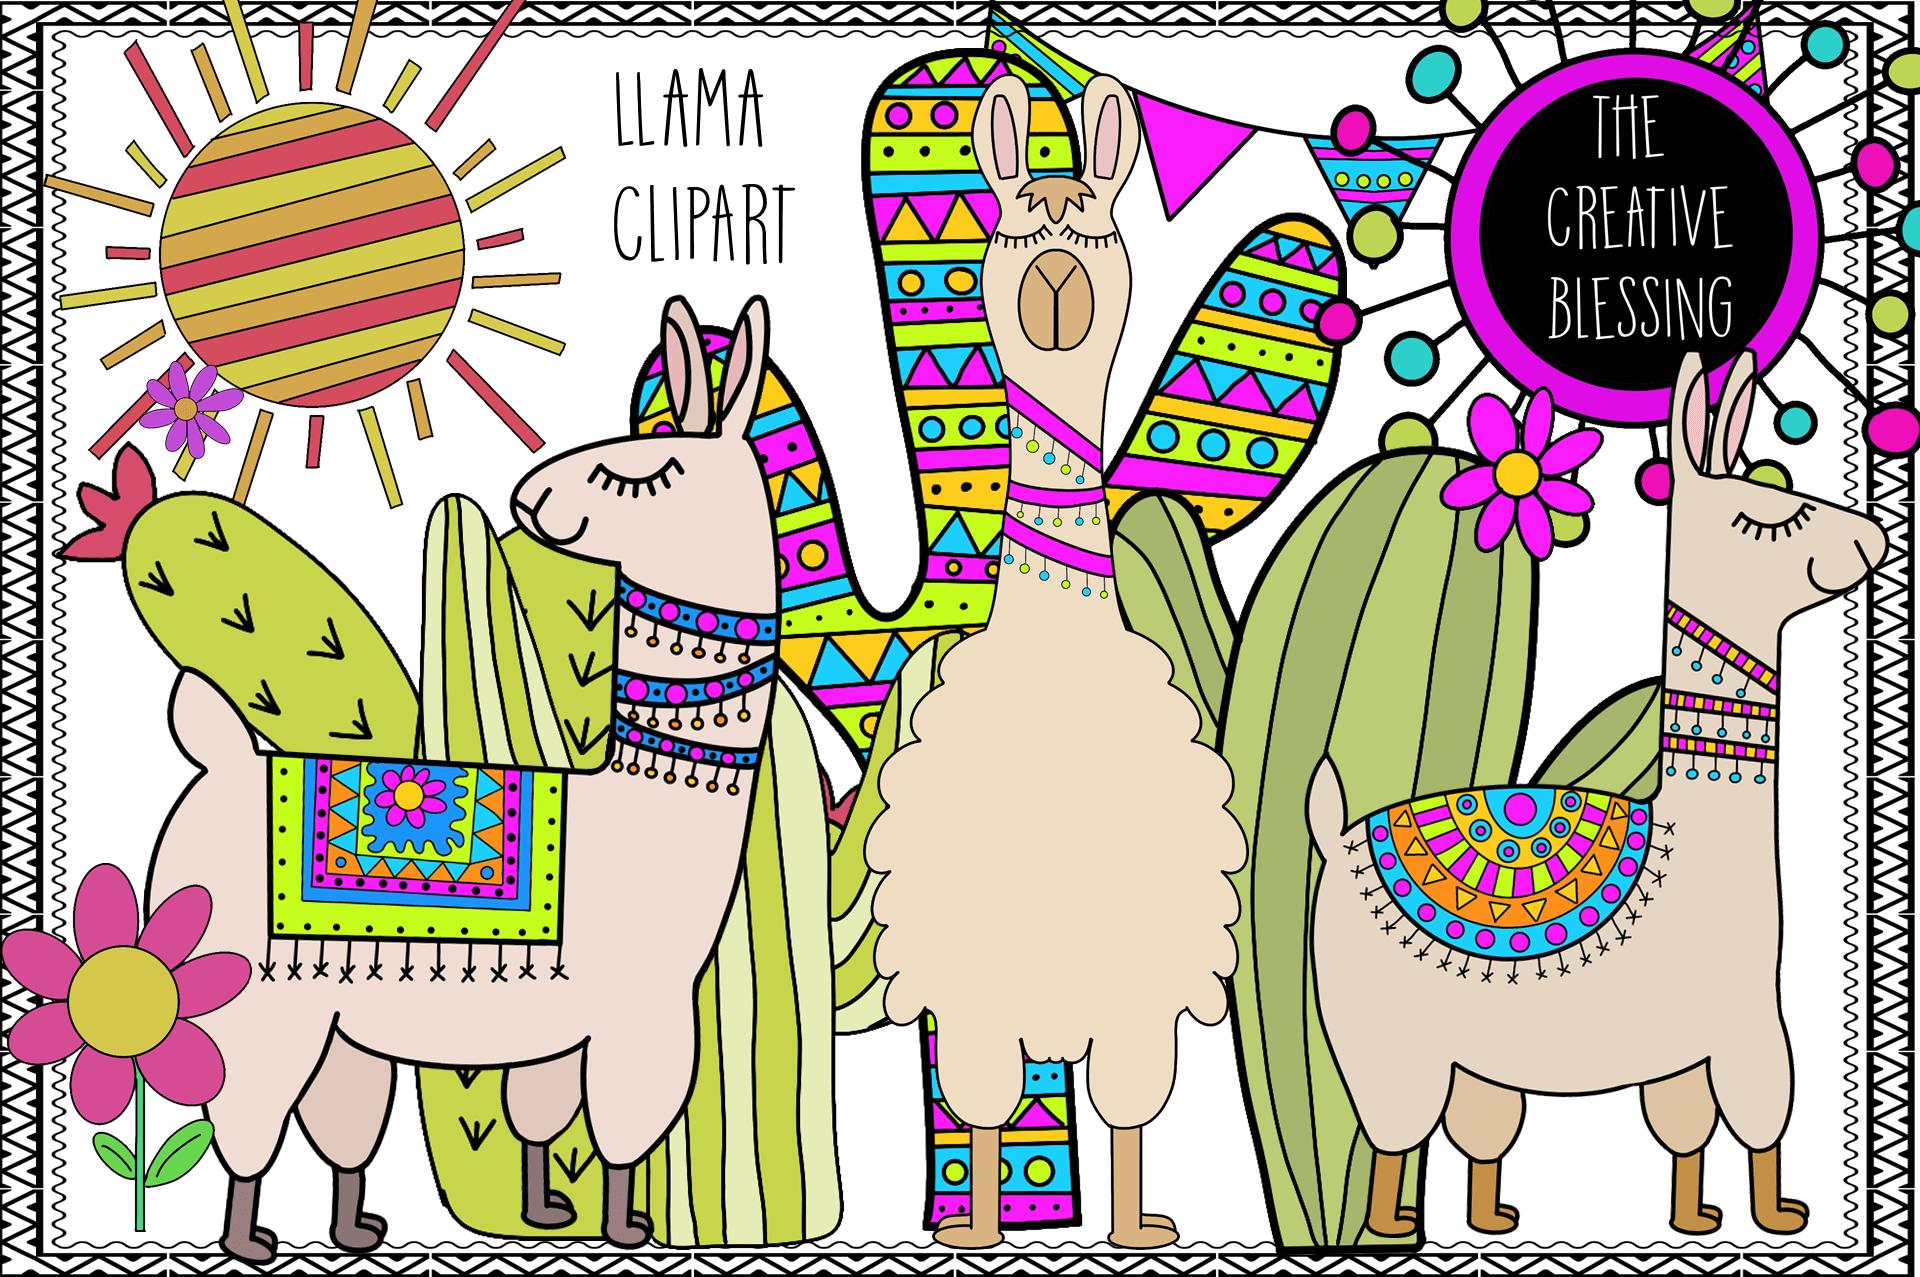 hight resolution of hand drawn llama clipart example image 1